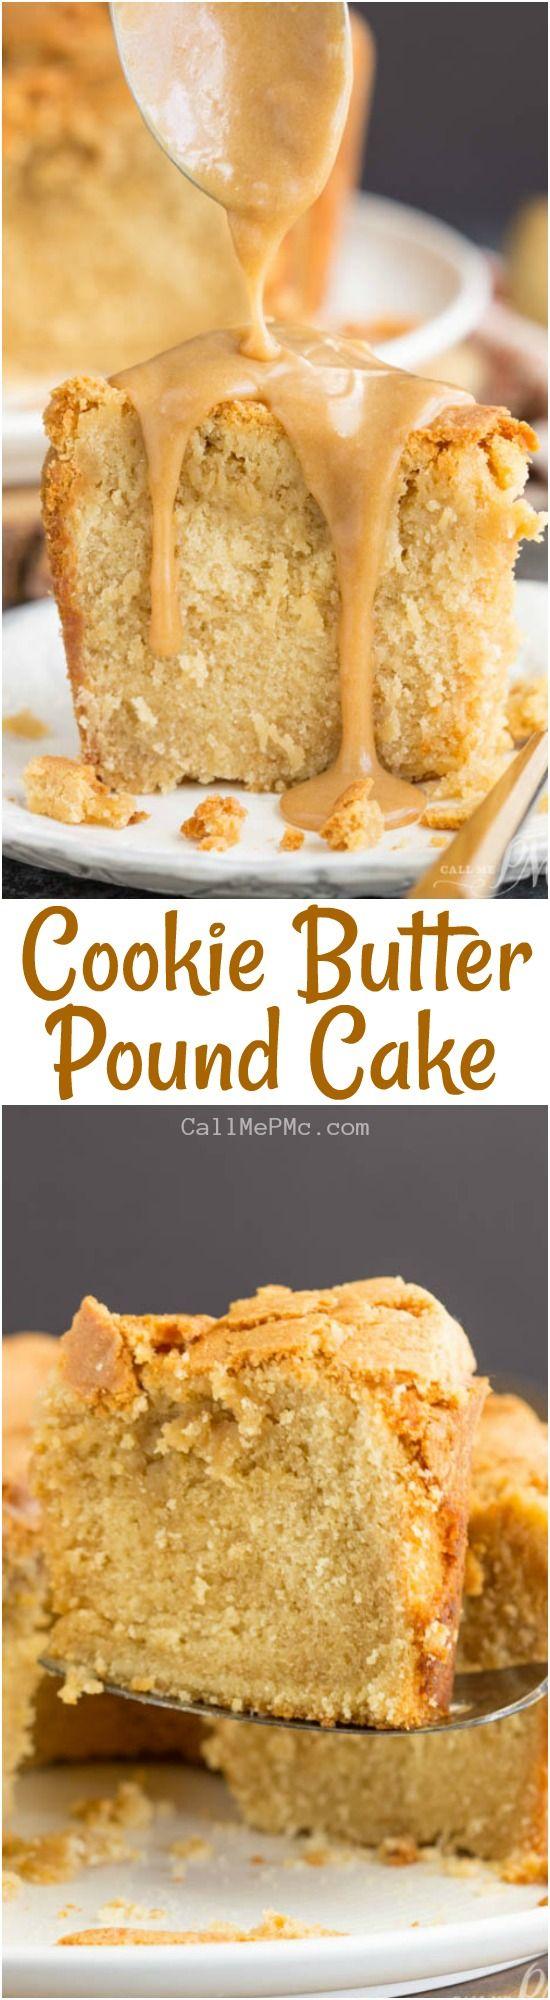 Cookie Butter Pound Cake https://www.callmepmc.com/cookie-butter-pound-cake/?utm_campaign=coschedule&utm_source=pinterest&utm_medium=Paula%20%7C%20CallMePMc.com&utm_content=Cookie%20Butter%20Pound%20Cake